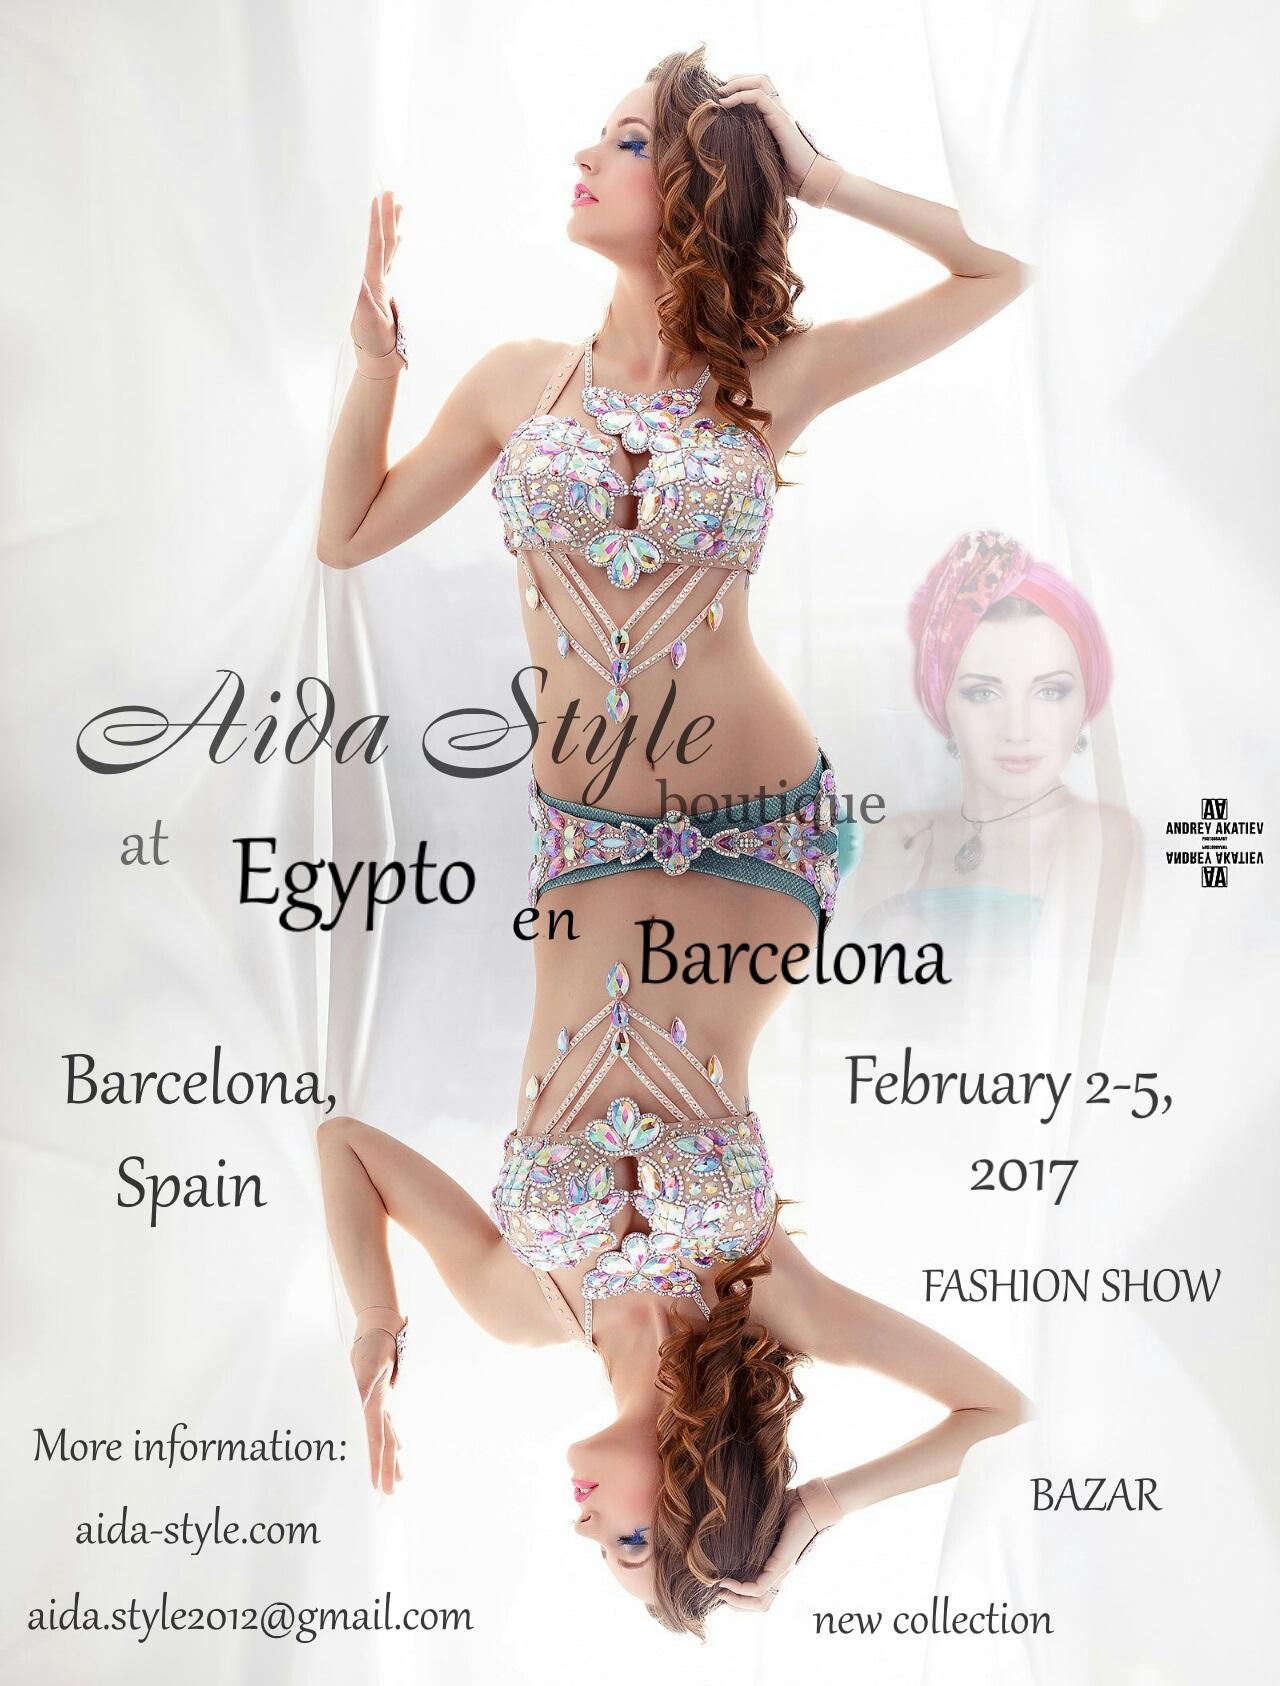 Aida Style costumes in Barcelona, at Egypto in Barcelona, Munique Neith belly dance festival